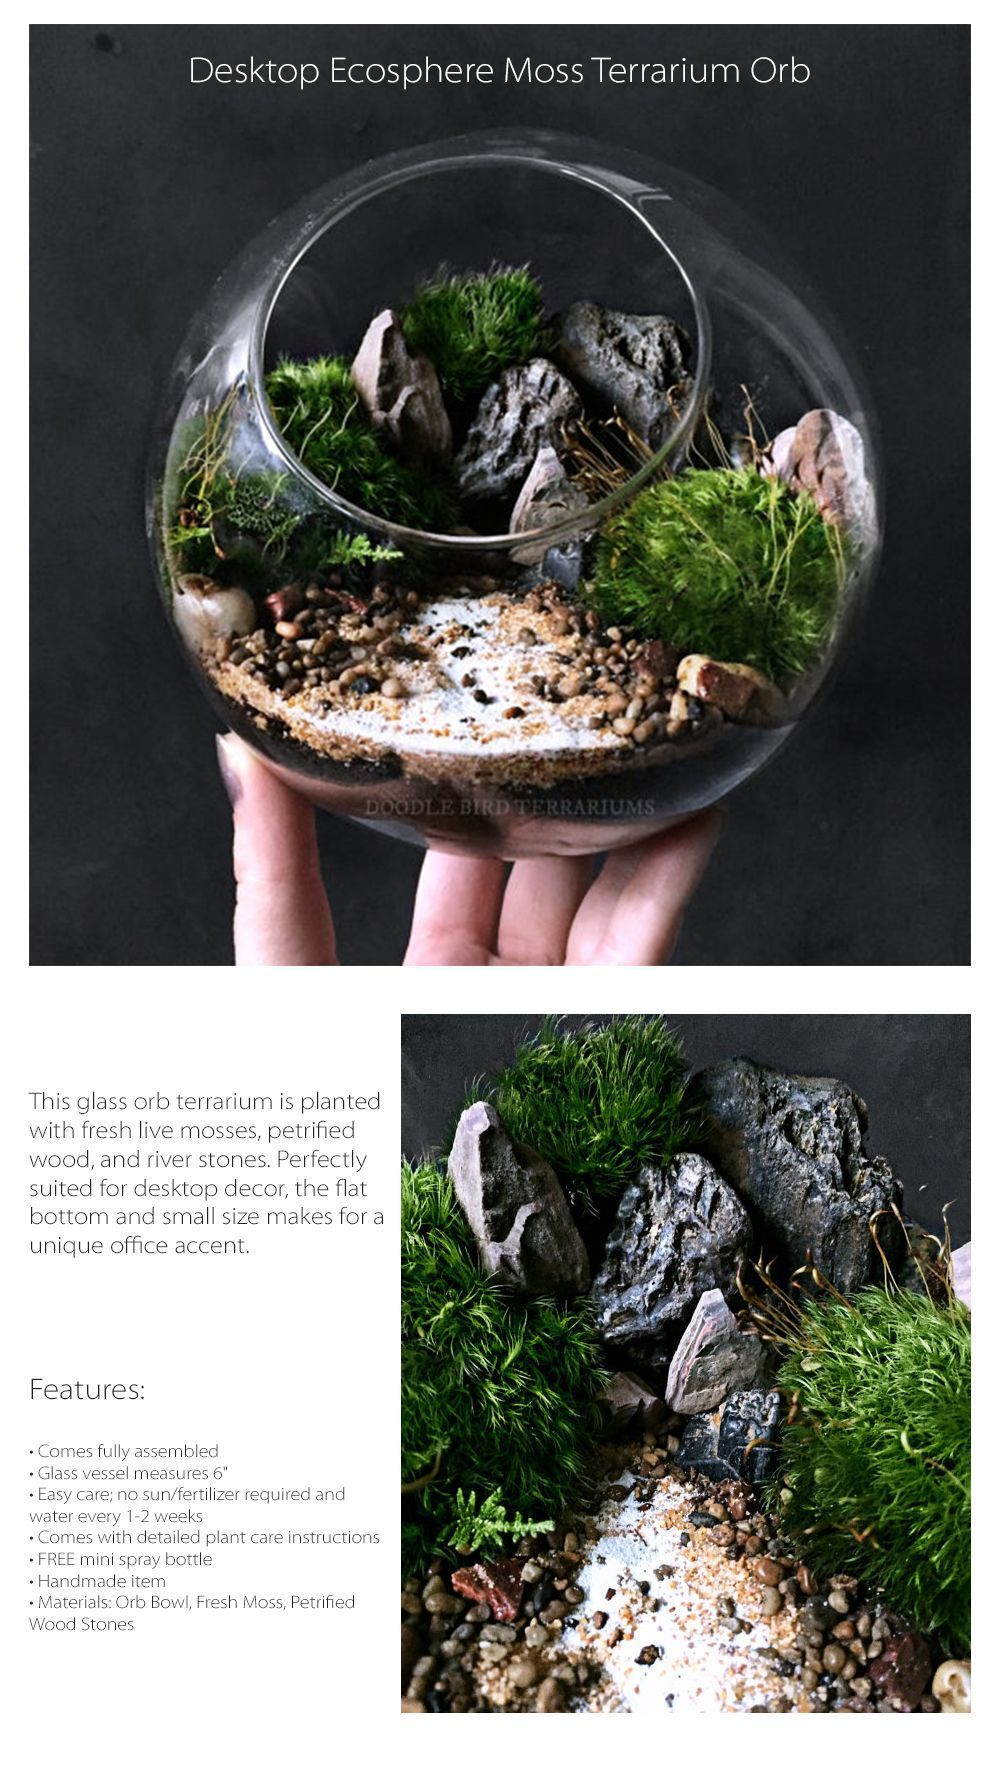 Desktop Ecosphere Moss Terrarium Orb Miniature Landscape Garden